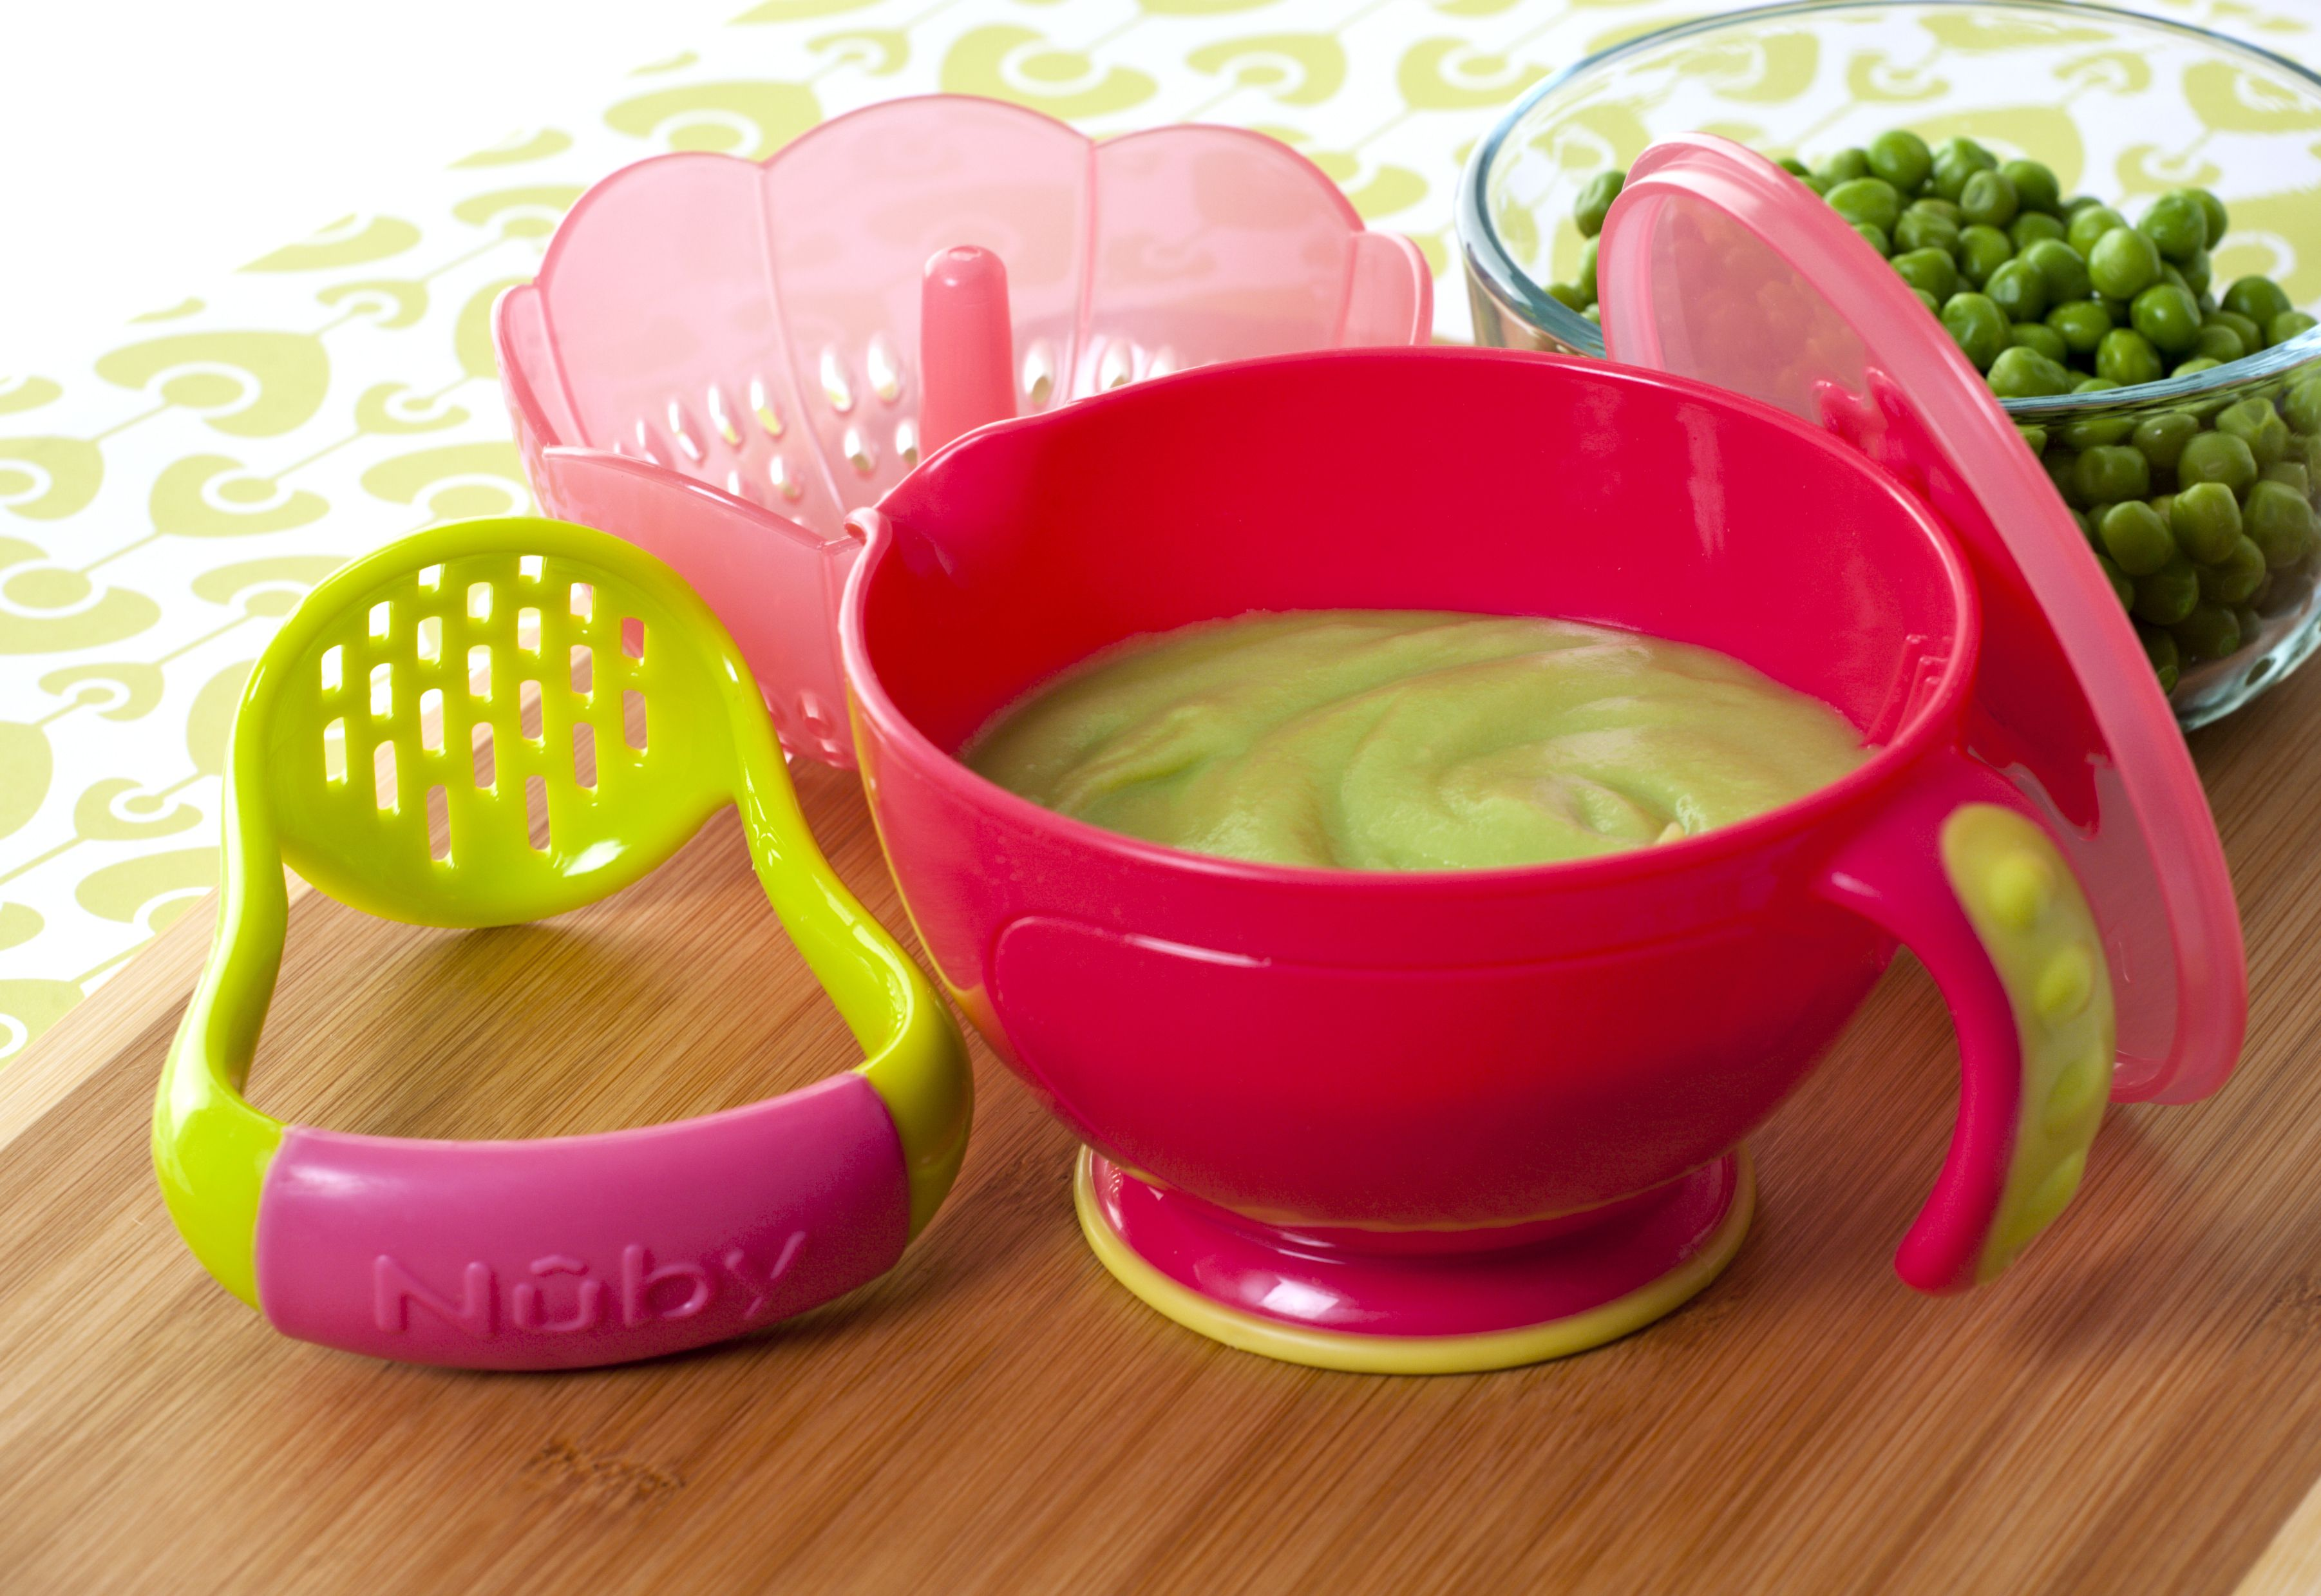 Baby Food Prep Bowl and Food Masher